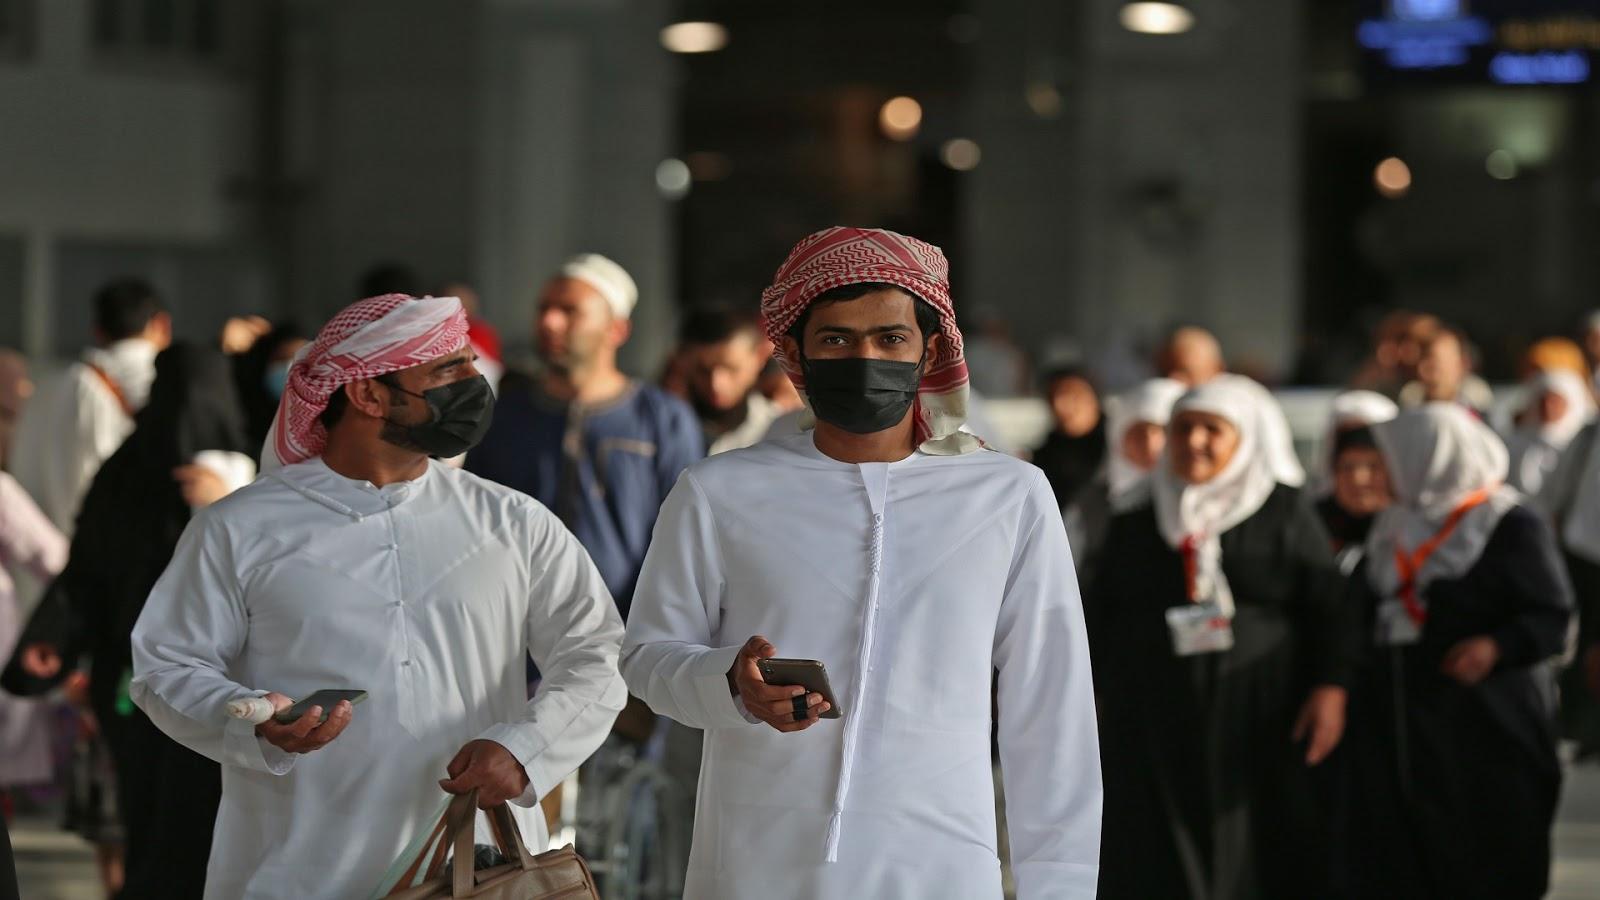 Pencegahan Corona di Arab, Dari Meliburkan Sekolah Hingga Menutup Masjid